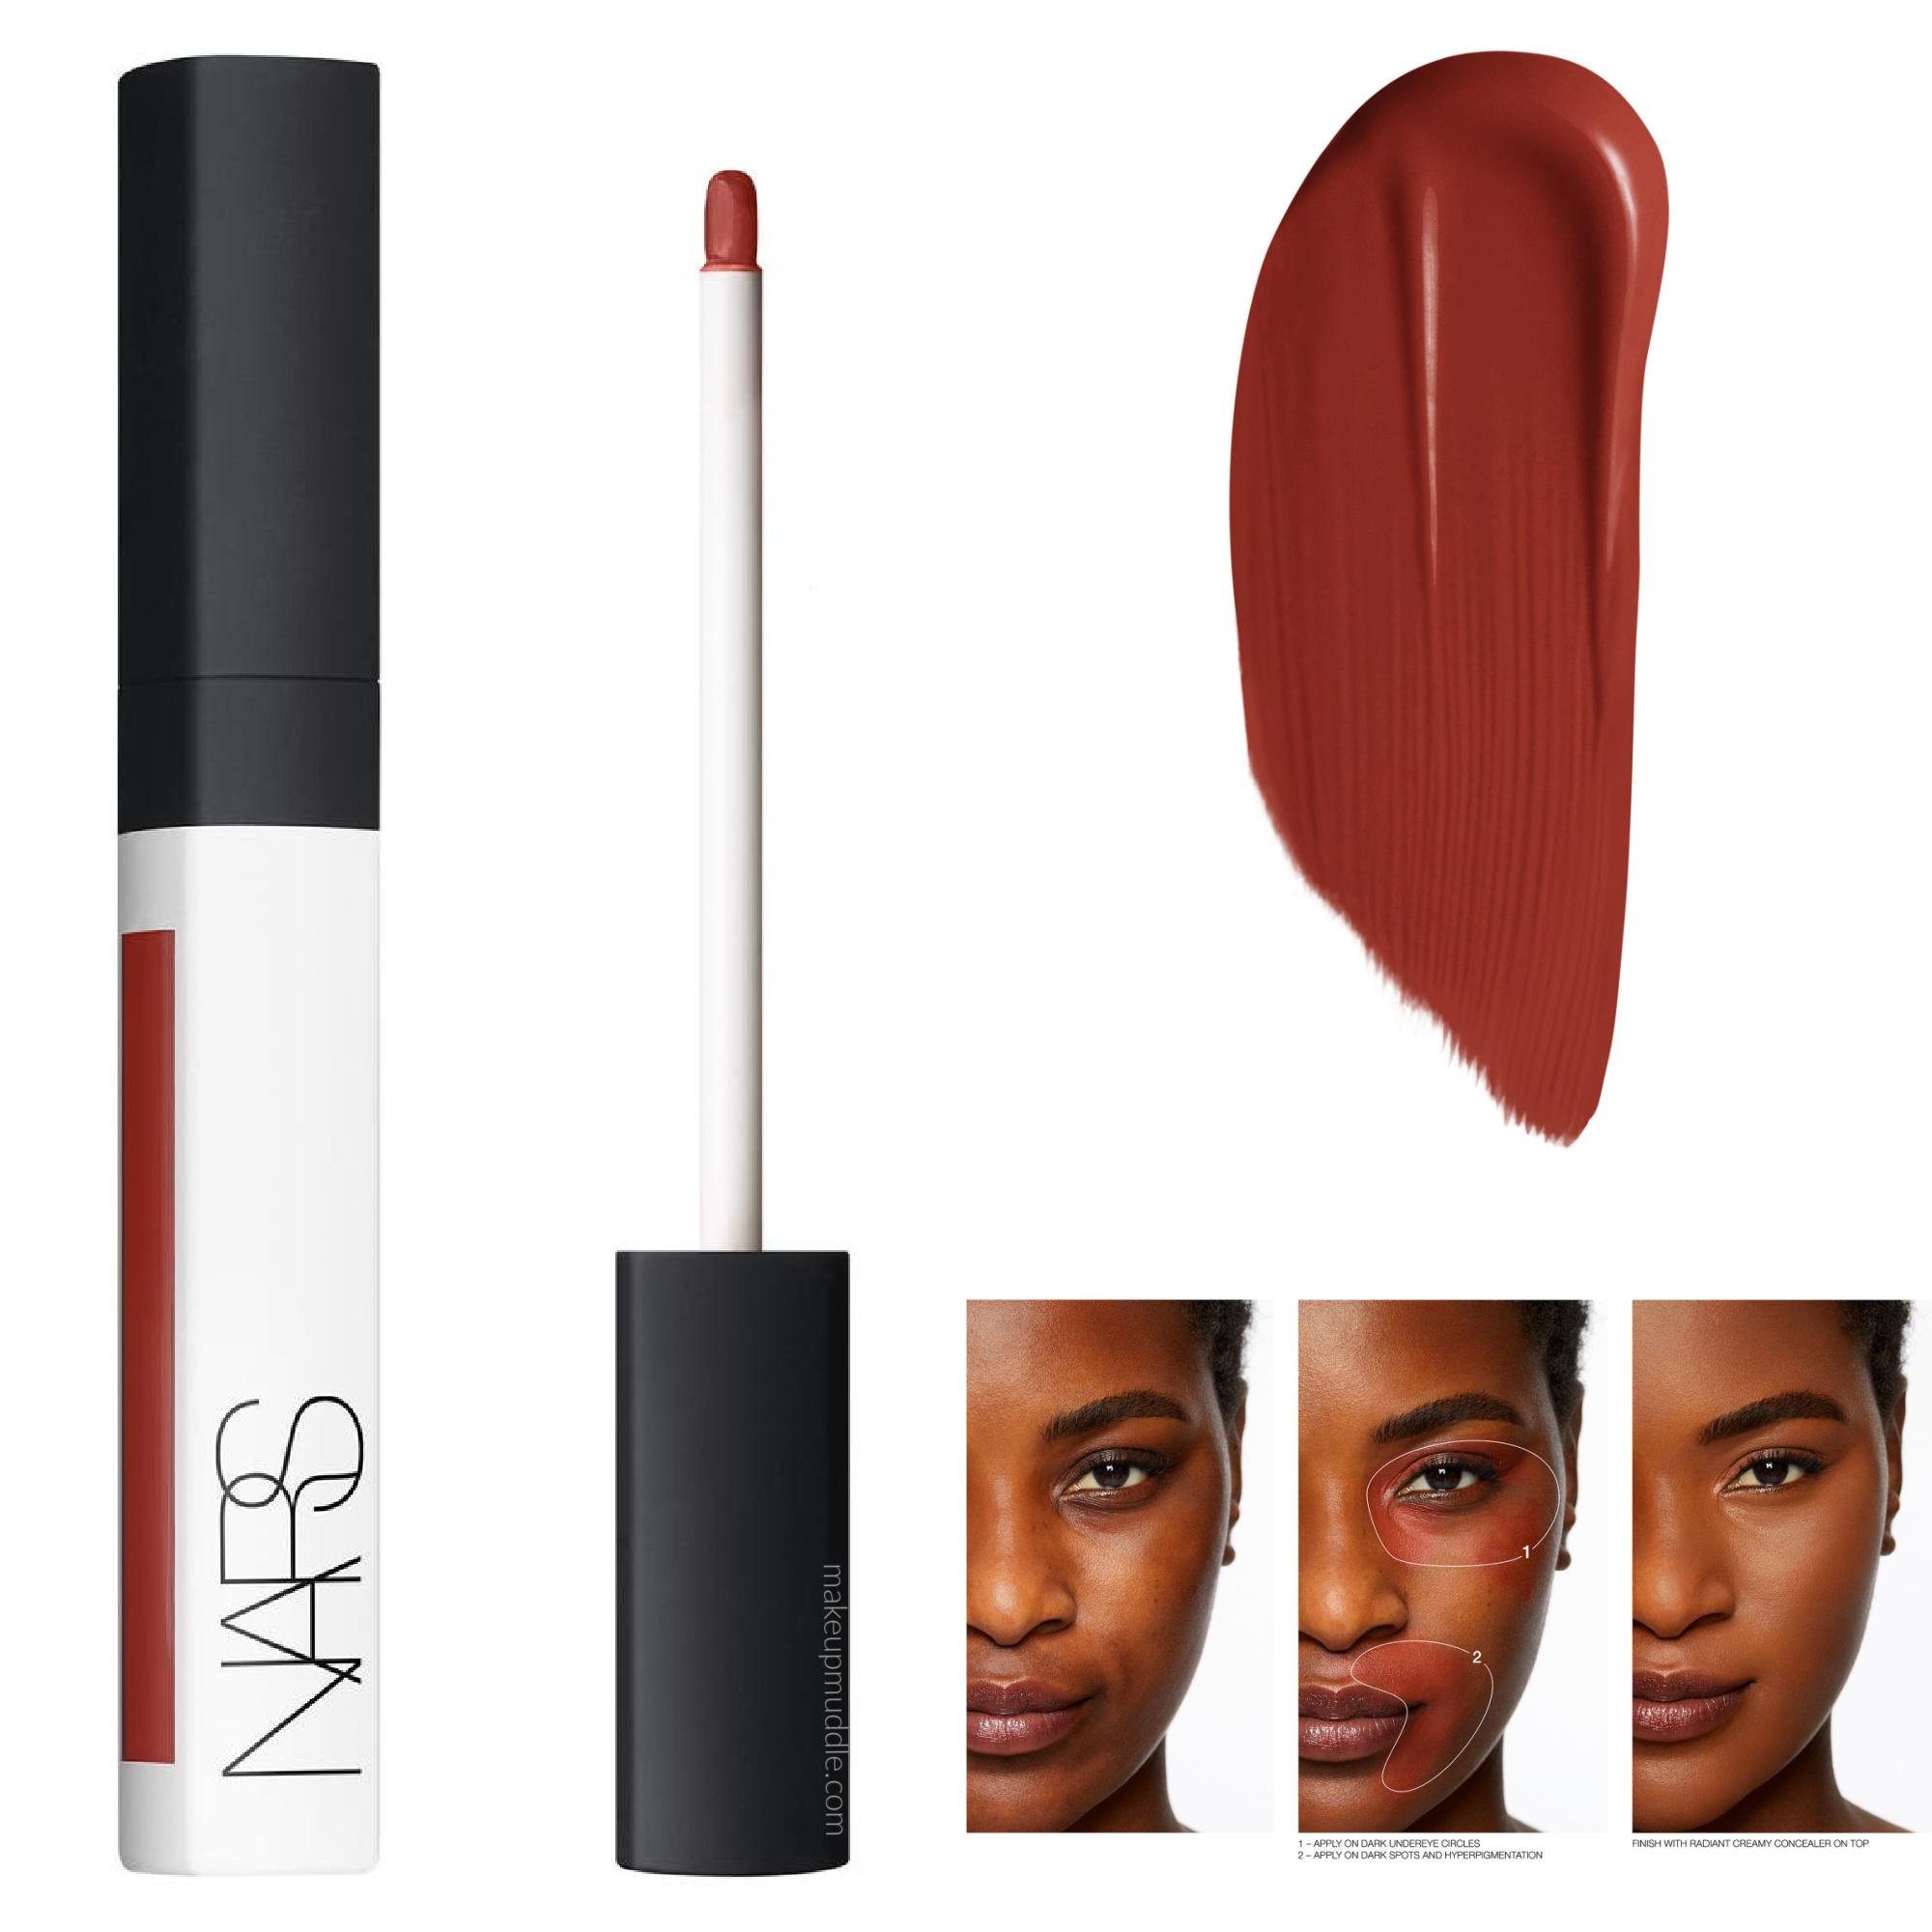 NARS Radiant Cream Color Correctors